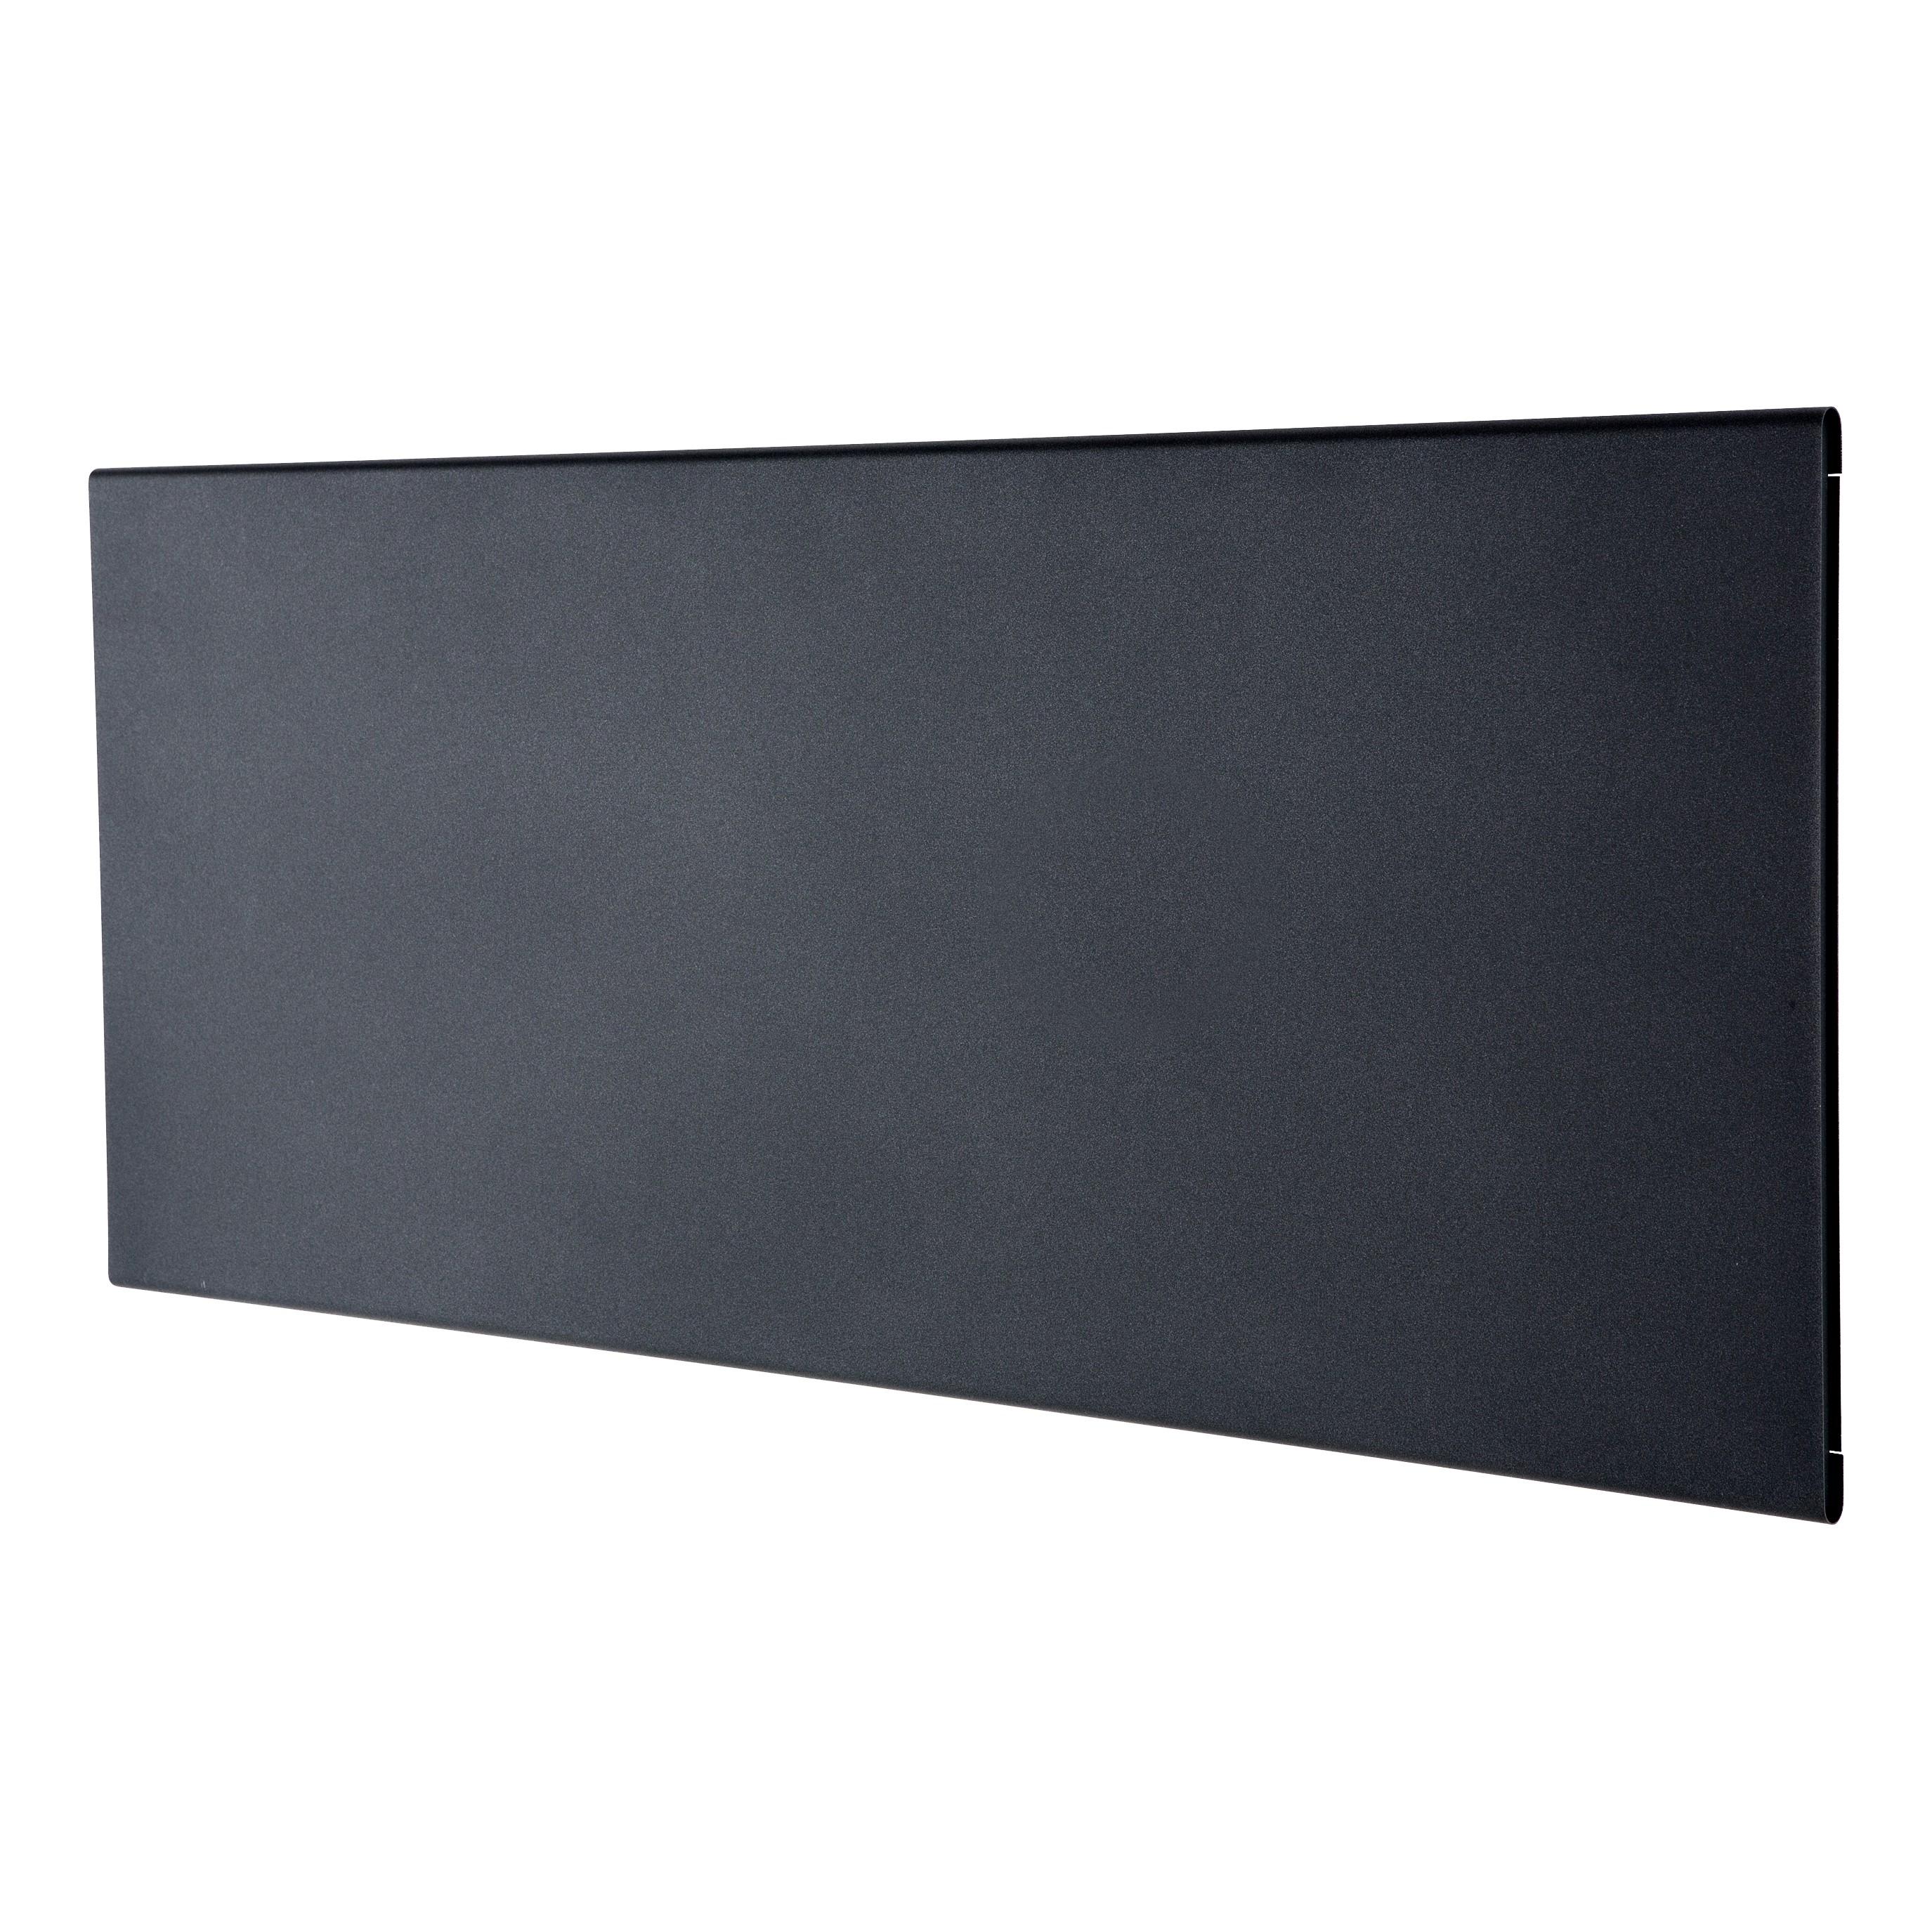 410344 : Adax Neo panelovn m/WiFi H 10 (grå)